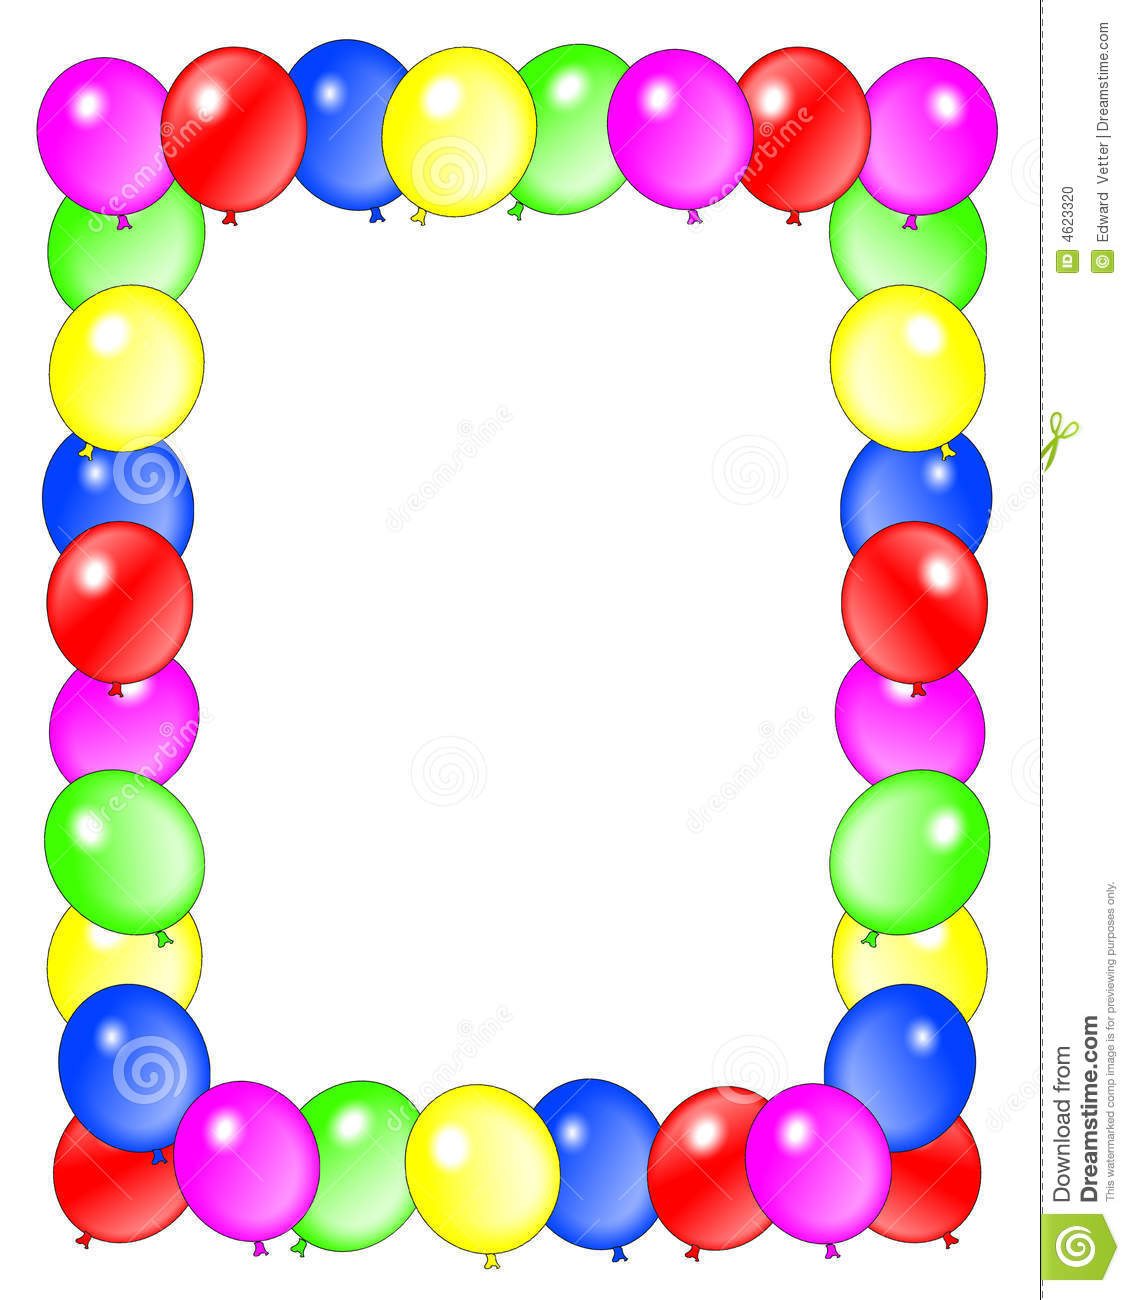 birthday-clip-art-borders-birthday-ballo-birthday-clip-art-borders-birthday-balloons-border-frame--9